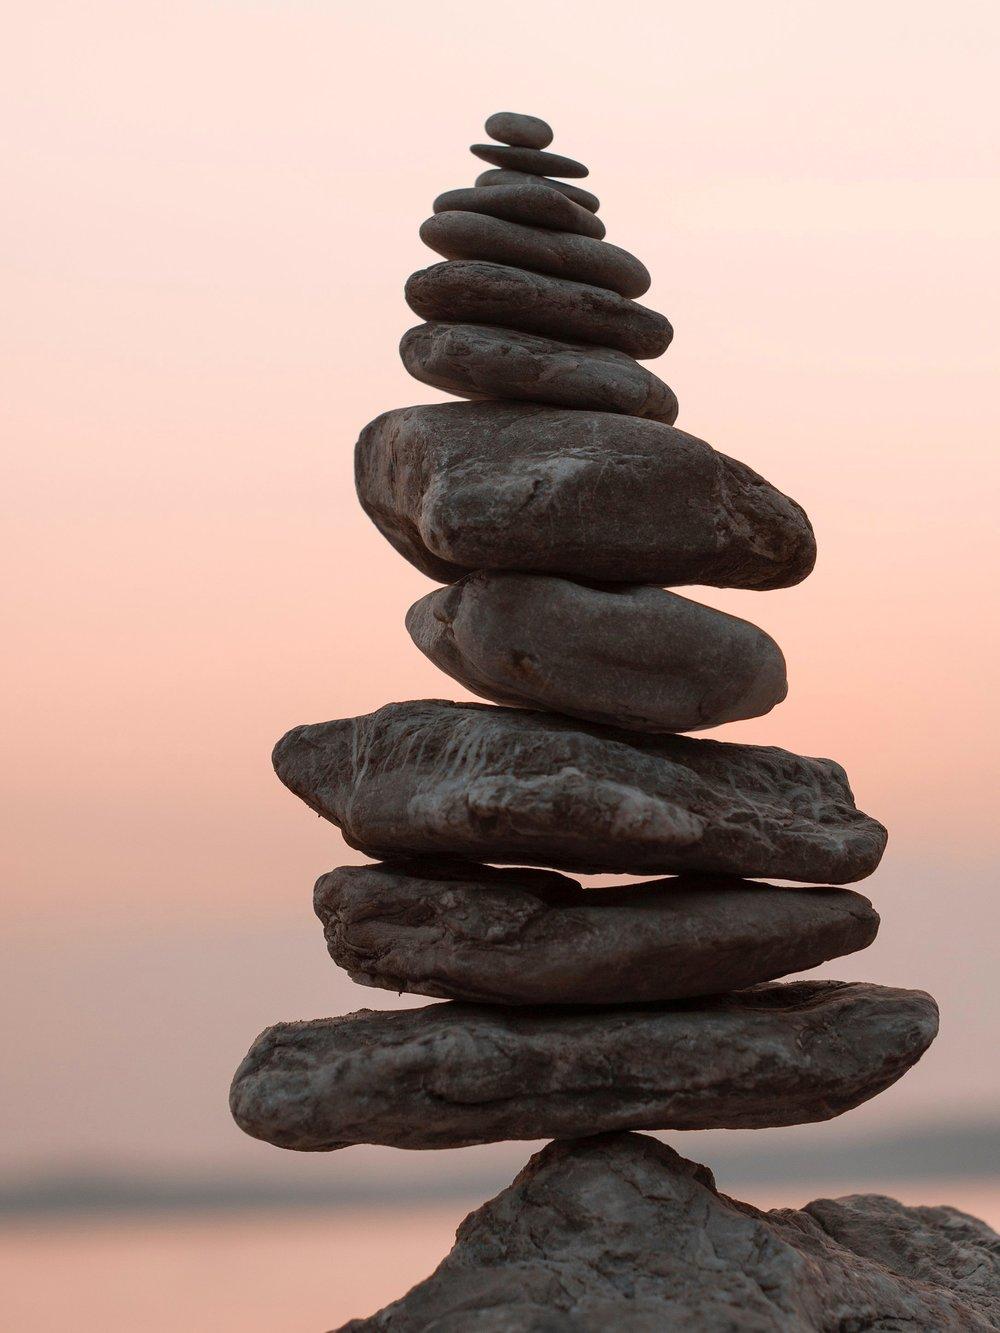 cairn_stones.jpg